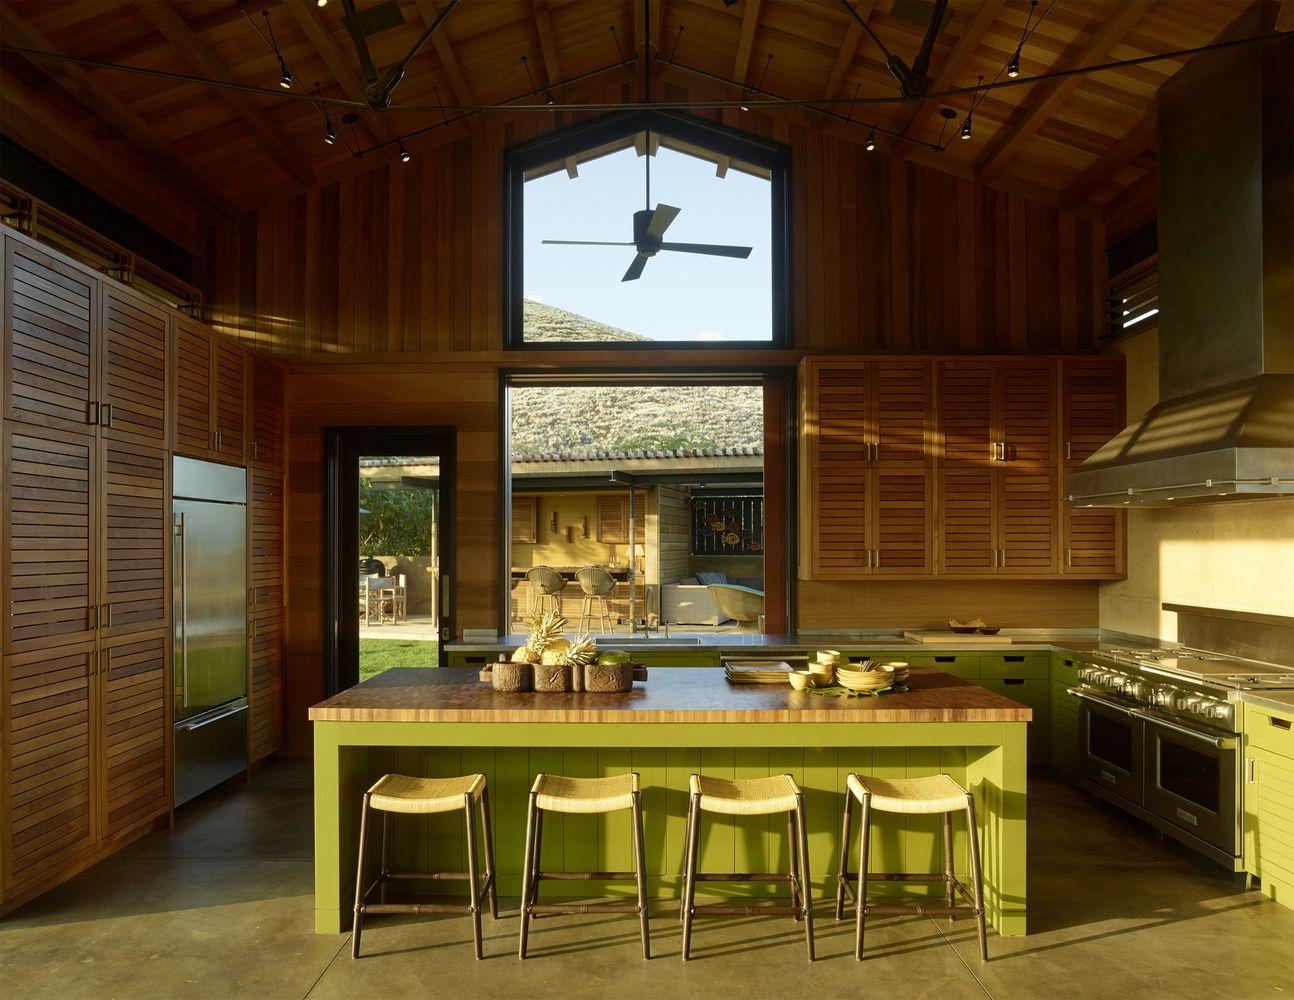 Excelente Da Cocina Kahului Ideas Ornamento Elaboración Festooning ...